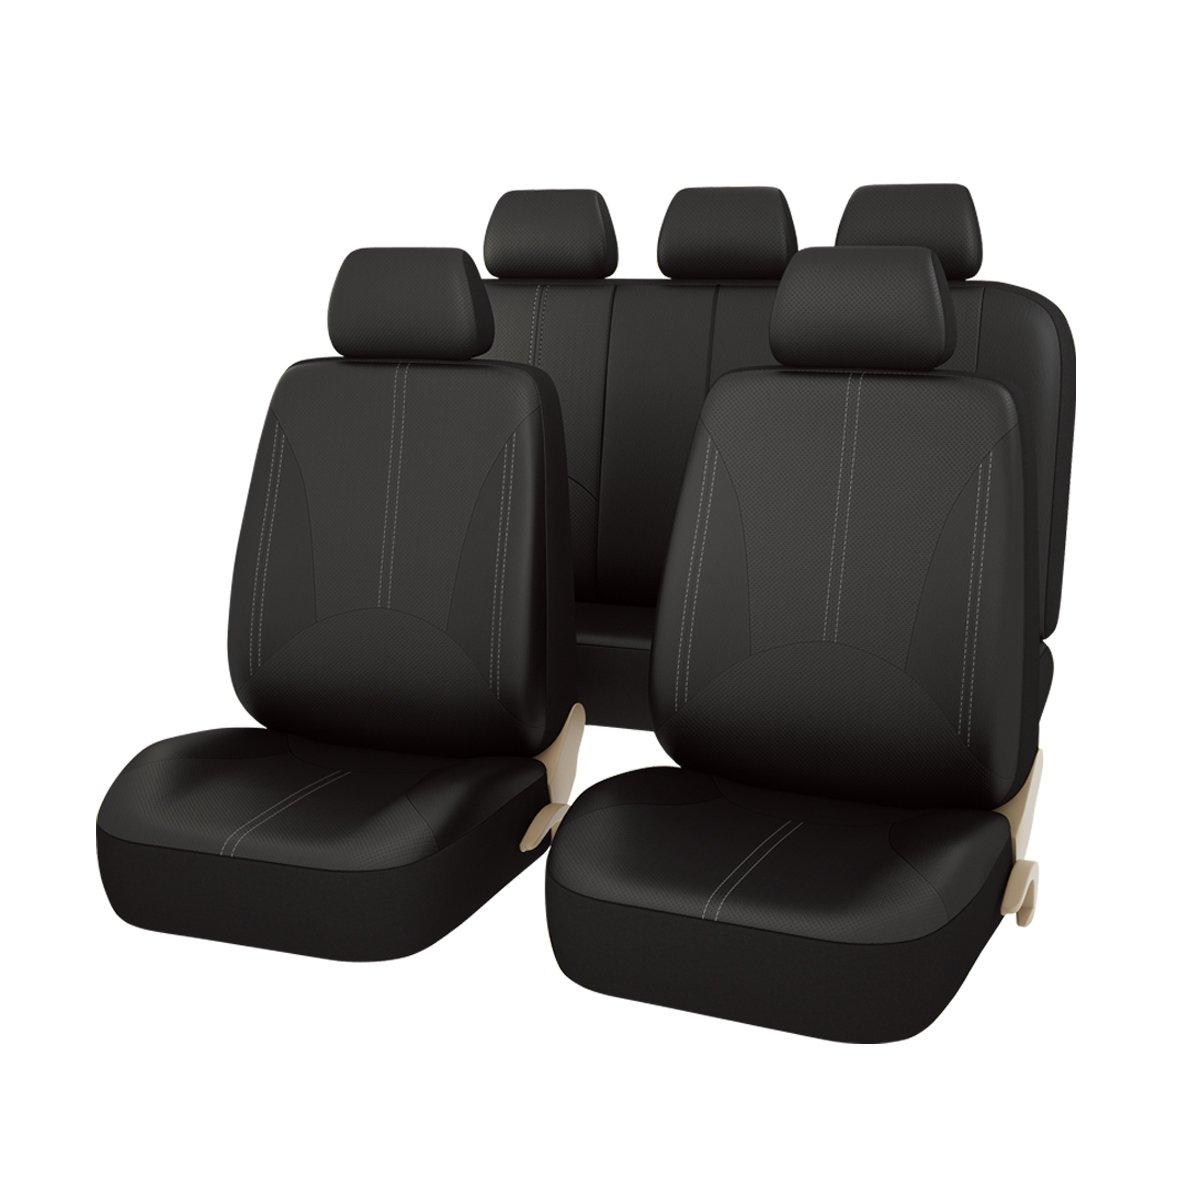 CAR PASS Automotive Package Universal Compatible